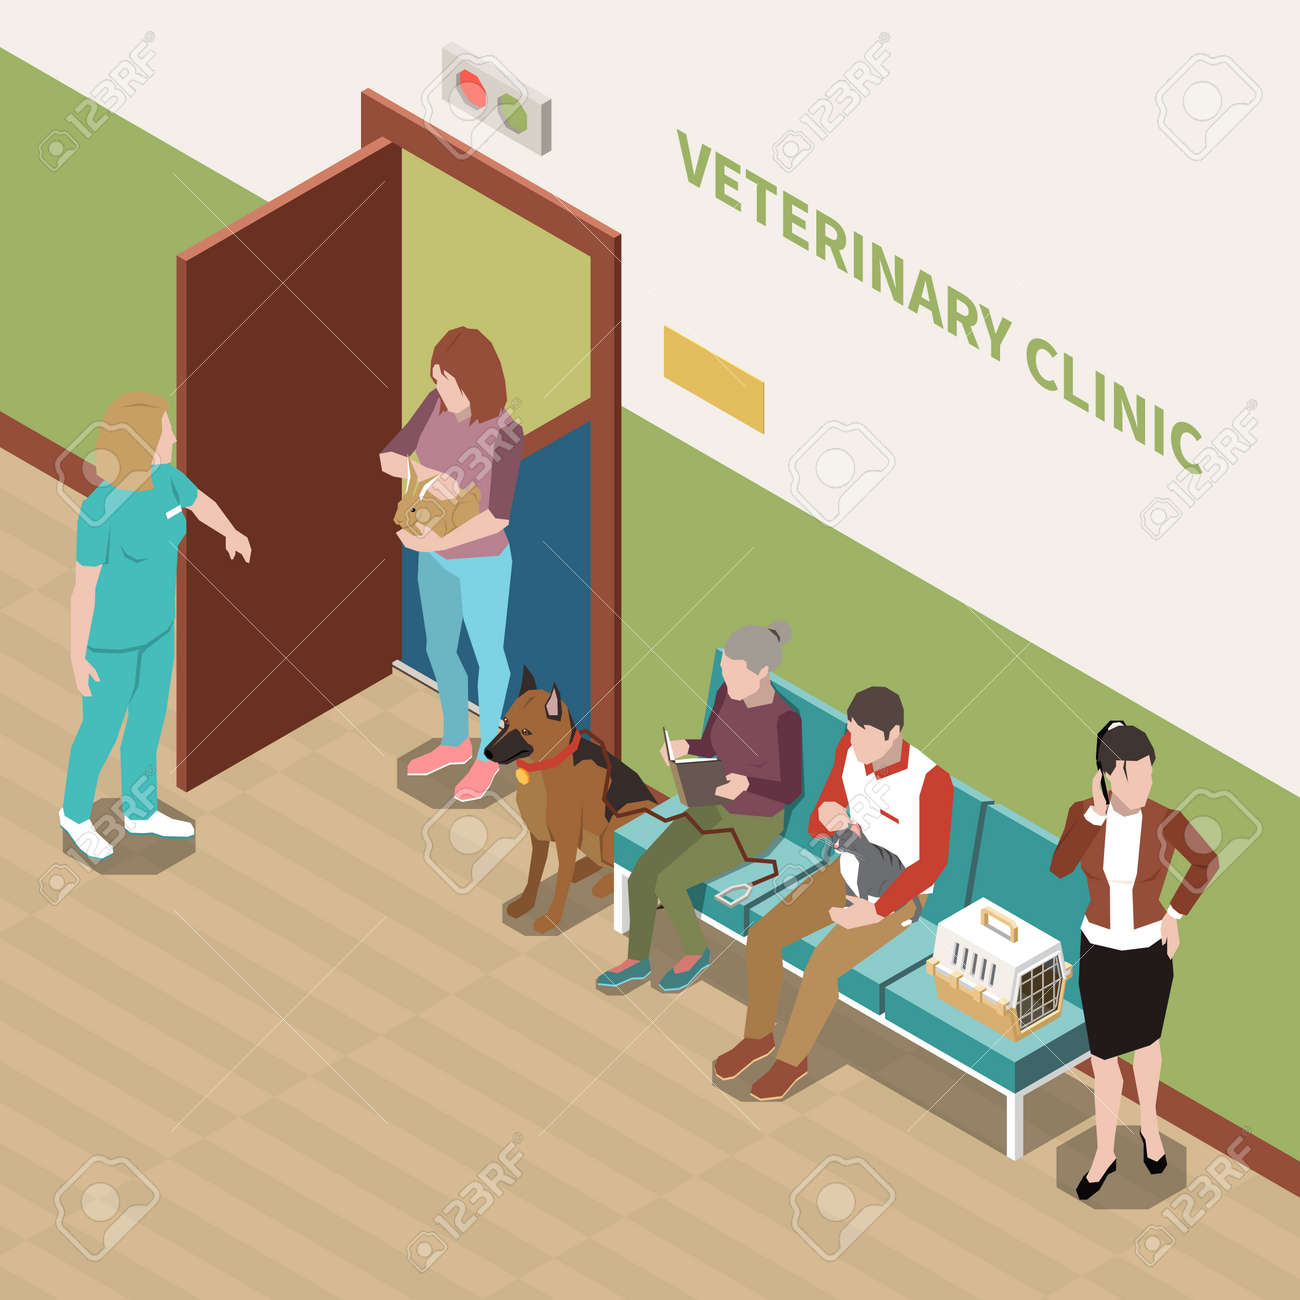 Veterinary Clinic Isometric Interior - 171721571